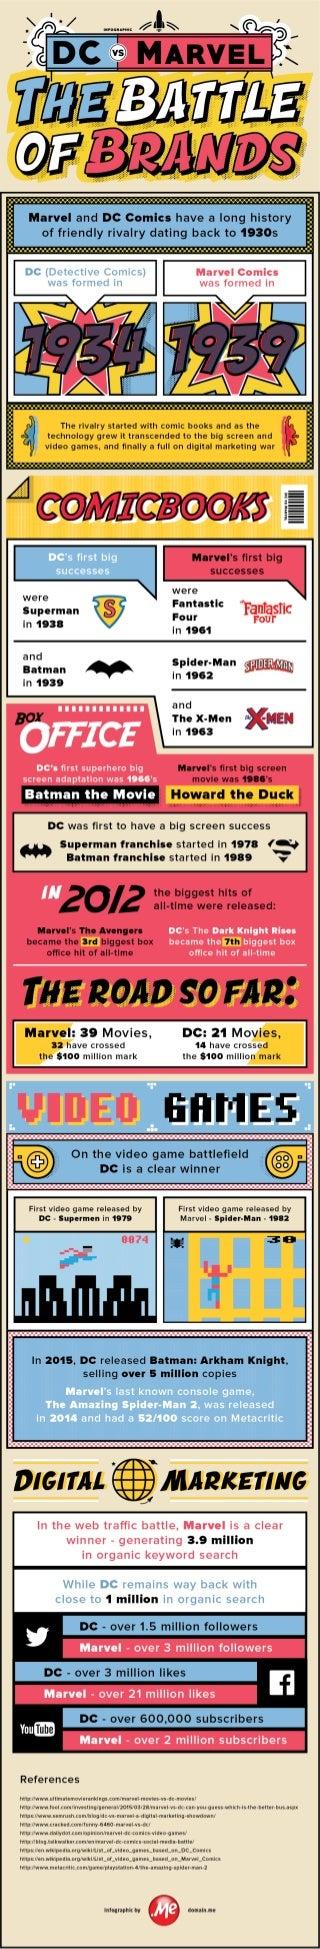 Infographic: DC vs Marvel - The Battle of Brands